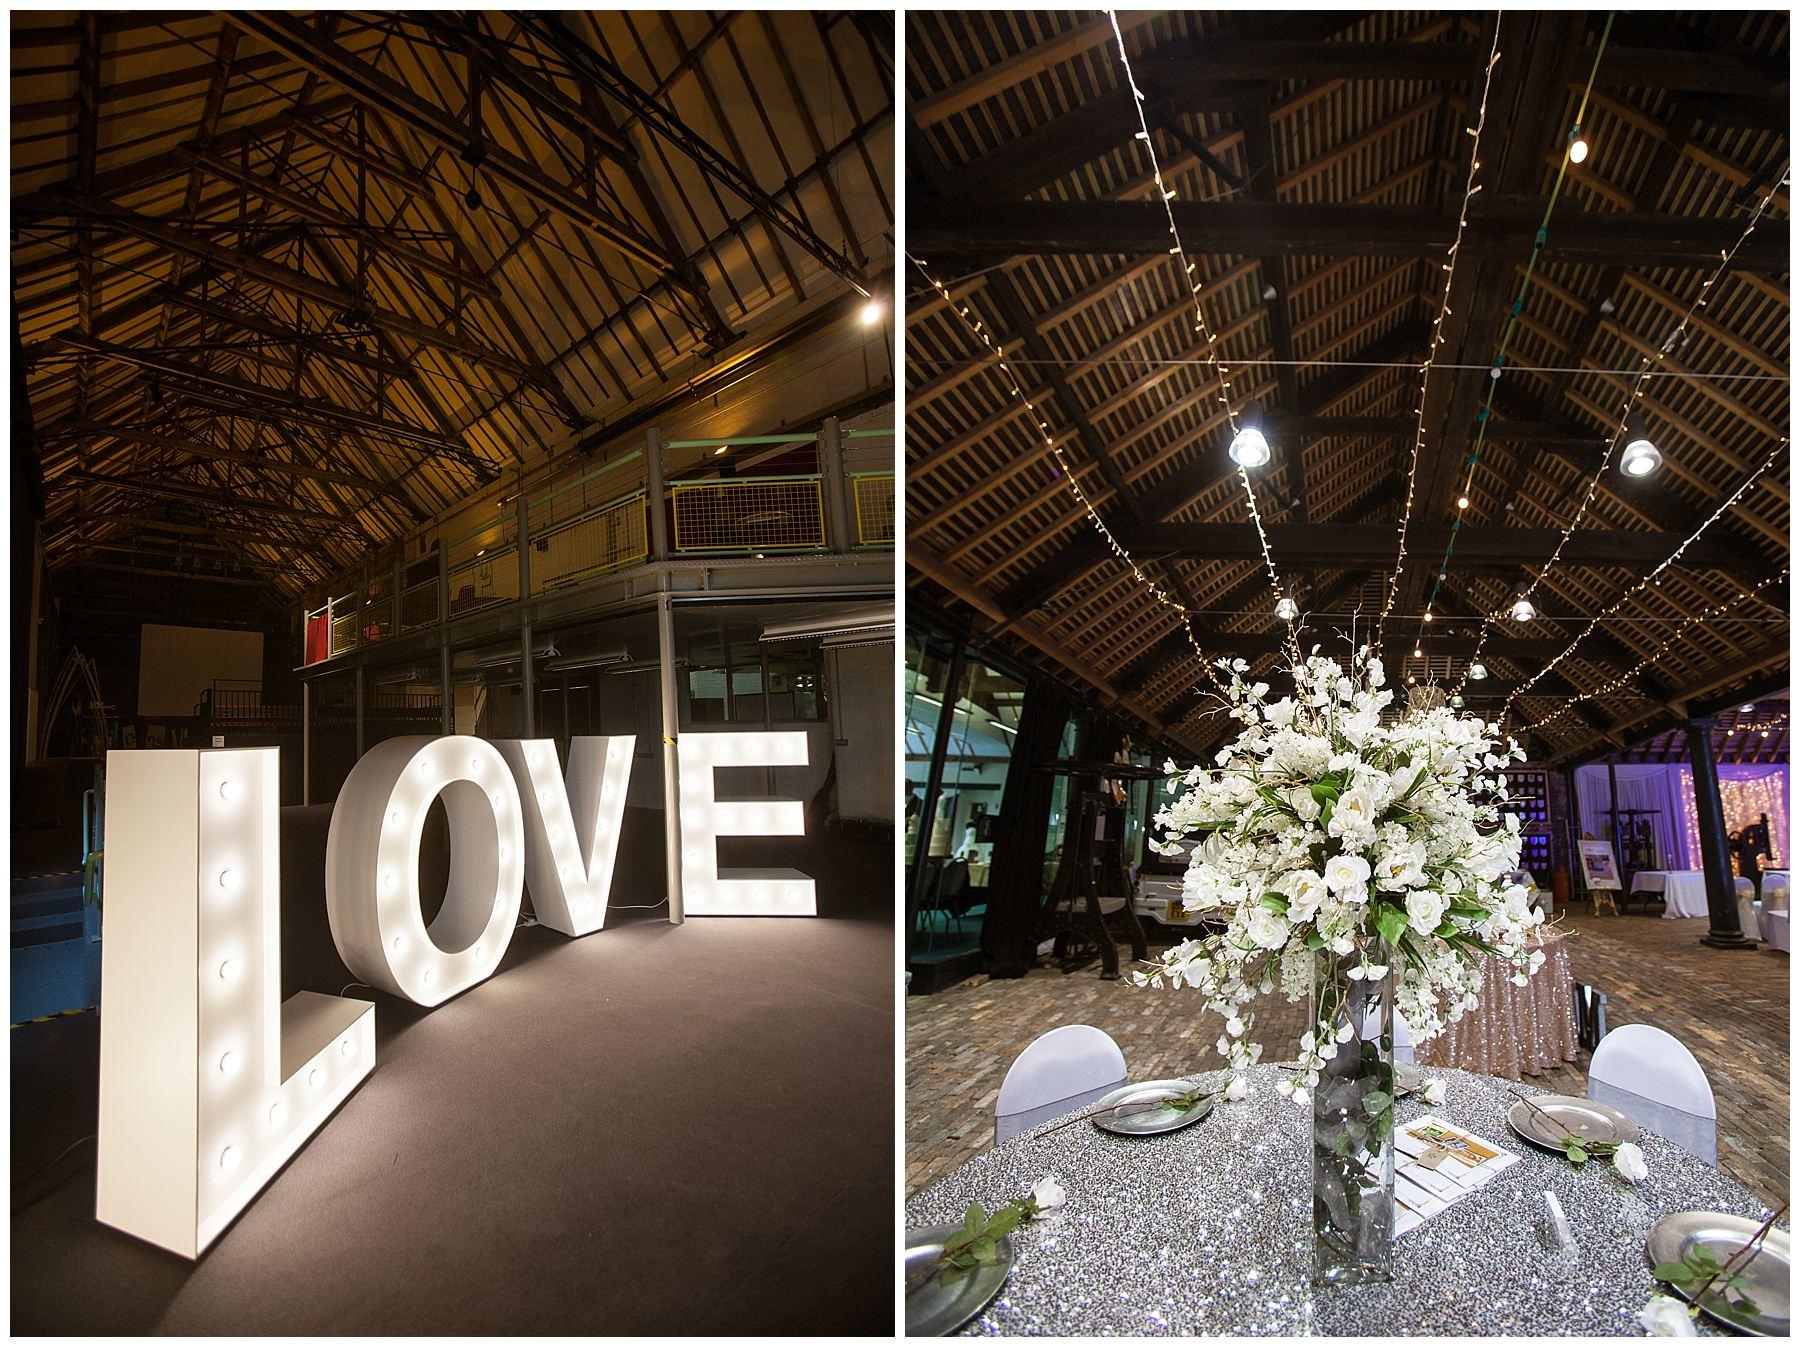 Ironbridge Gorge Musuem set up for wedding - best wedding venues shropshire